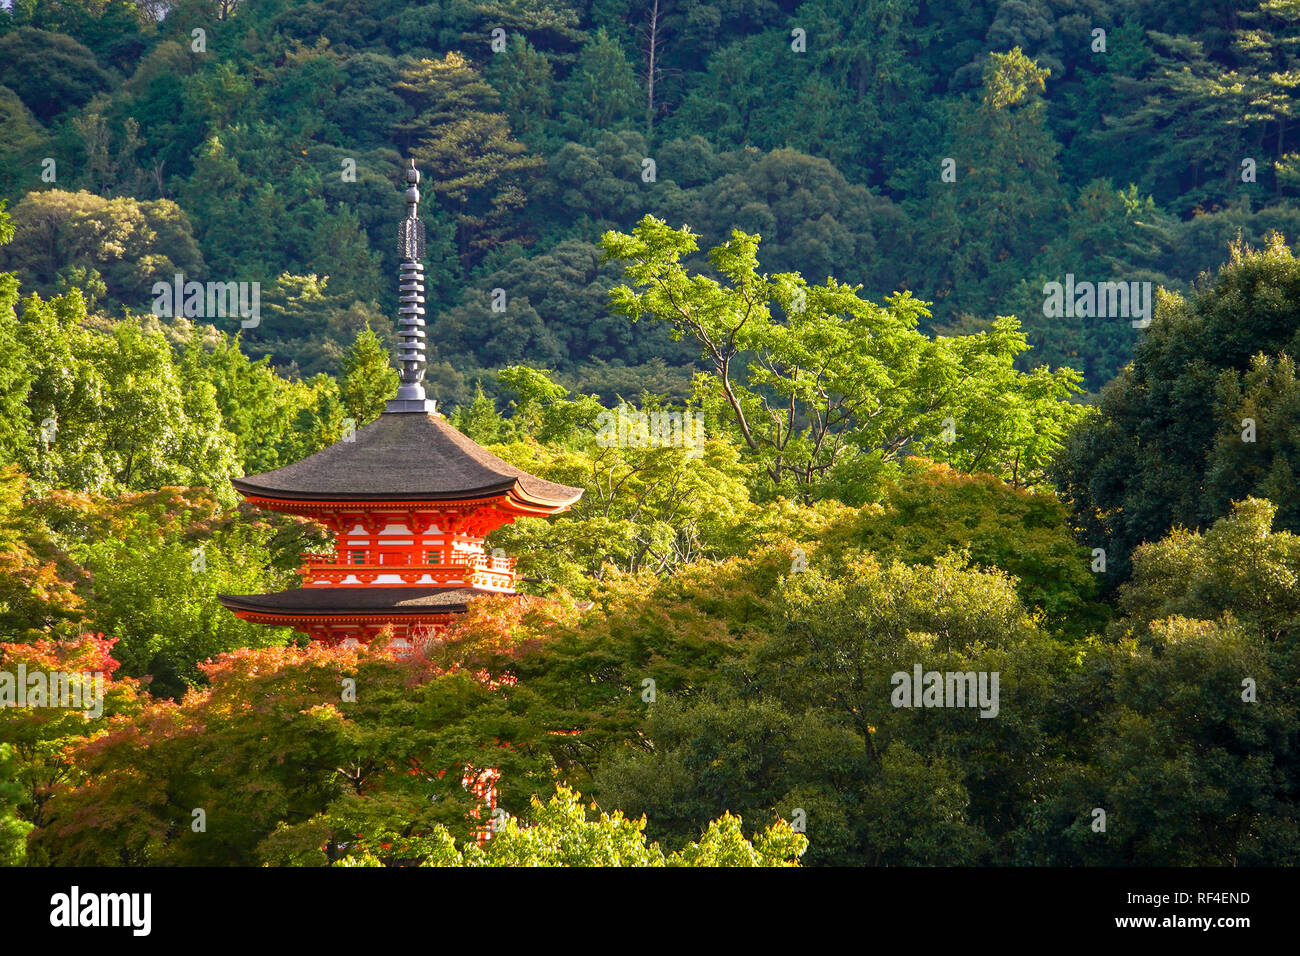 Kiyomizu-dera, officially Otowa-san Kiyomizu-dera, is an independent Buddhist temple in eastern Kyoto, Japan Stock Photo